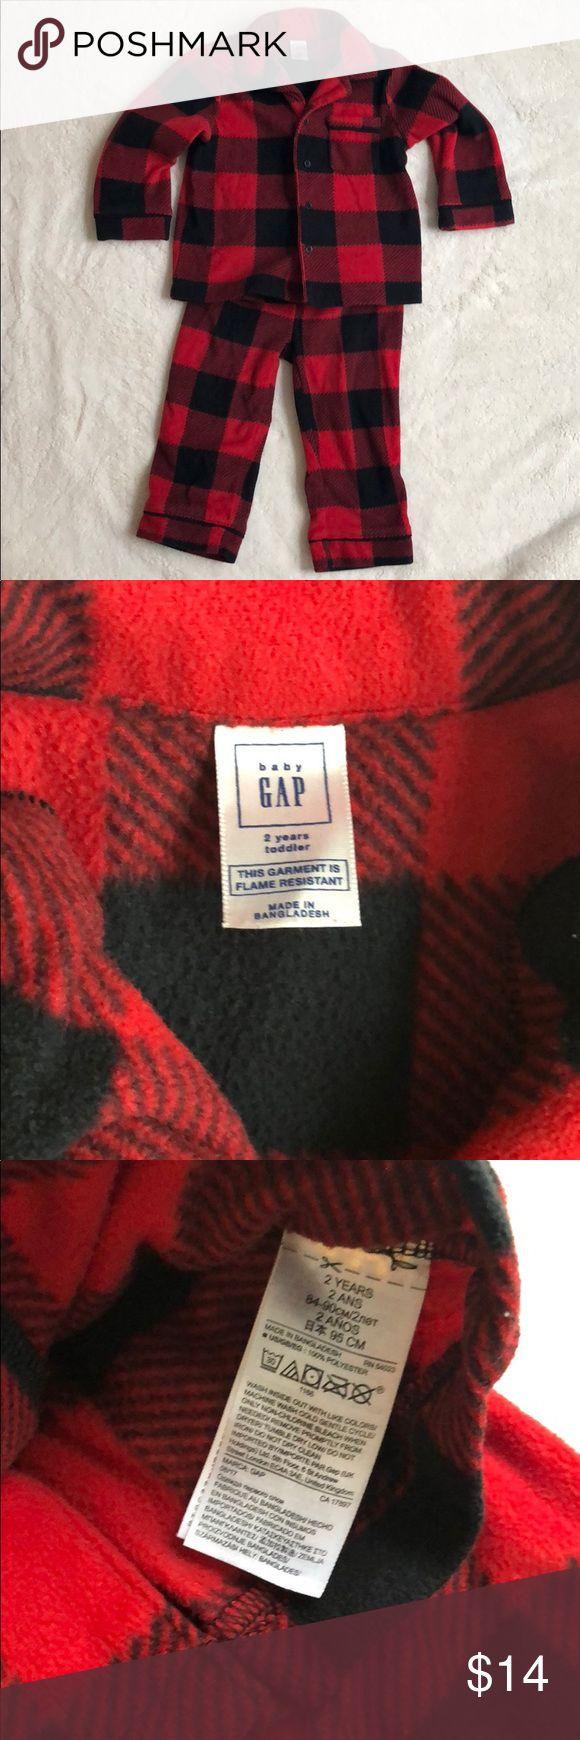 Gap Red & Black Buffalo Check Fleece Pajamas 2T This is a